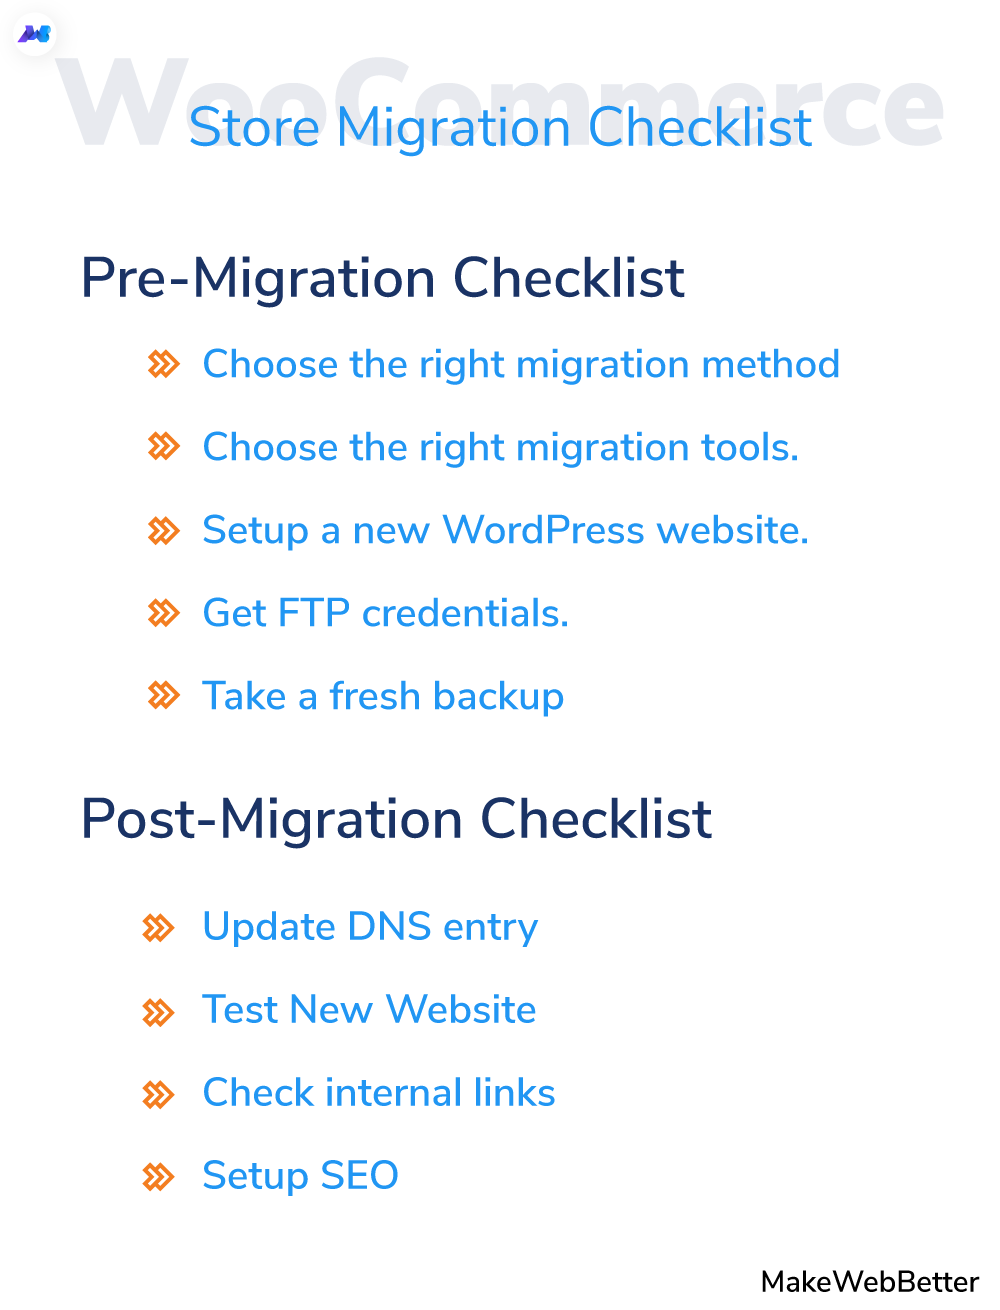 woocommerce migration checklist